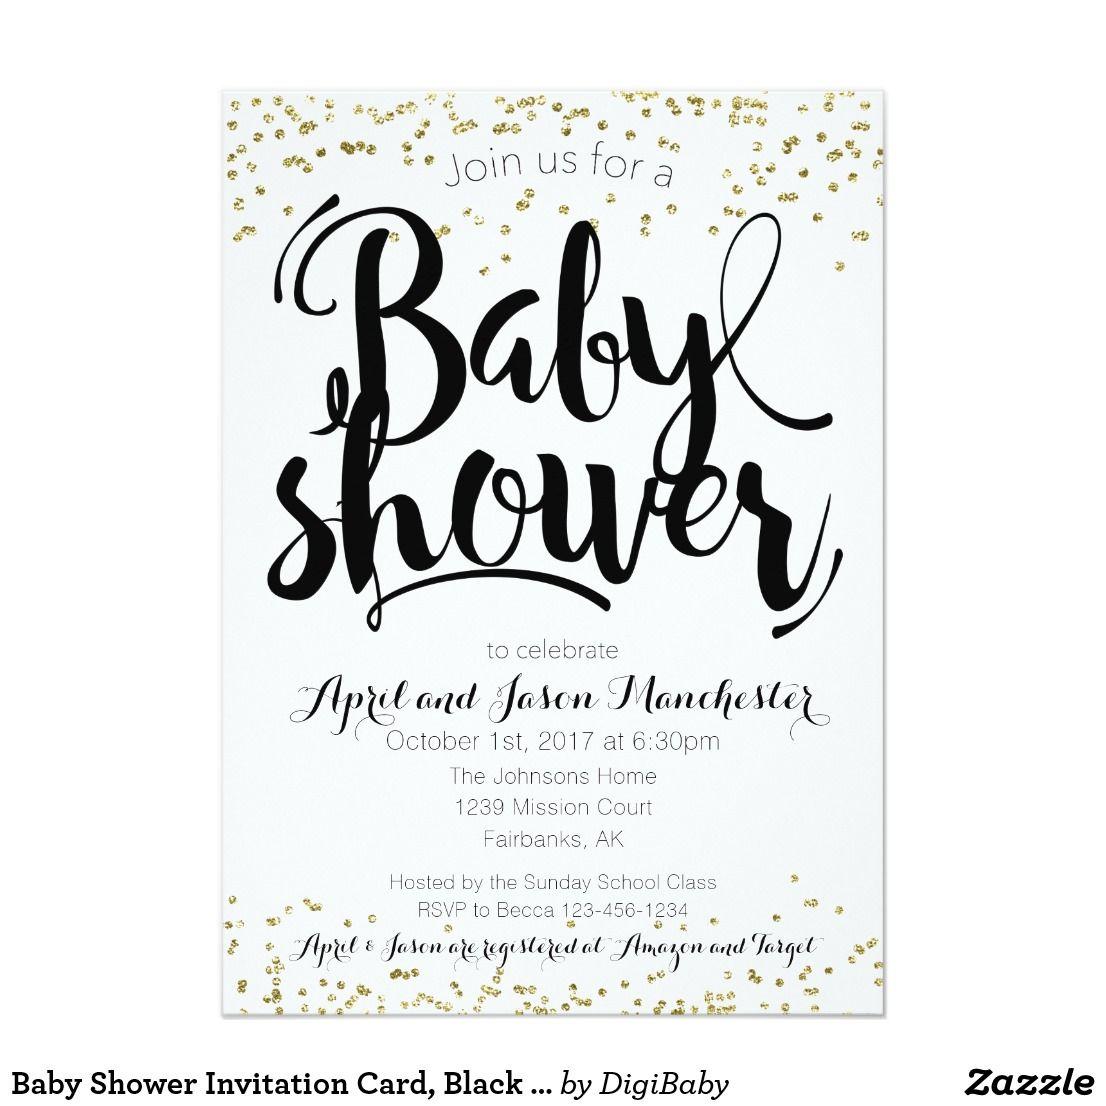 Baby Shower Invitation Card Black White Gold Zazzle Com Baby Shower Invitation Cards Baby Shower Invitations Shower Invitations